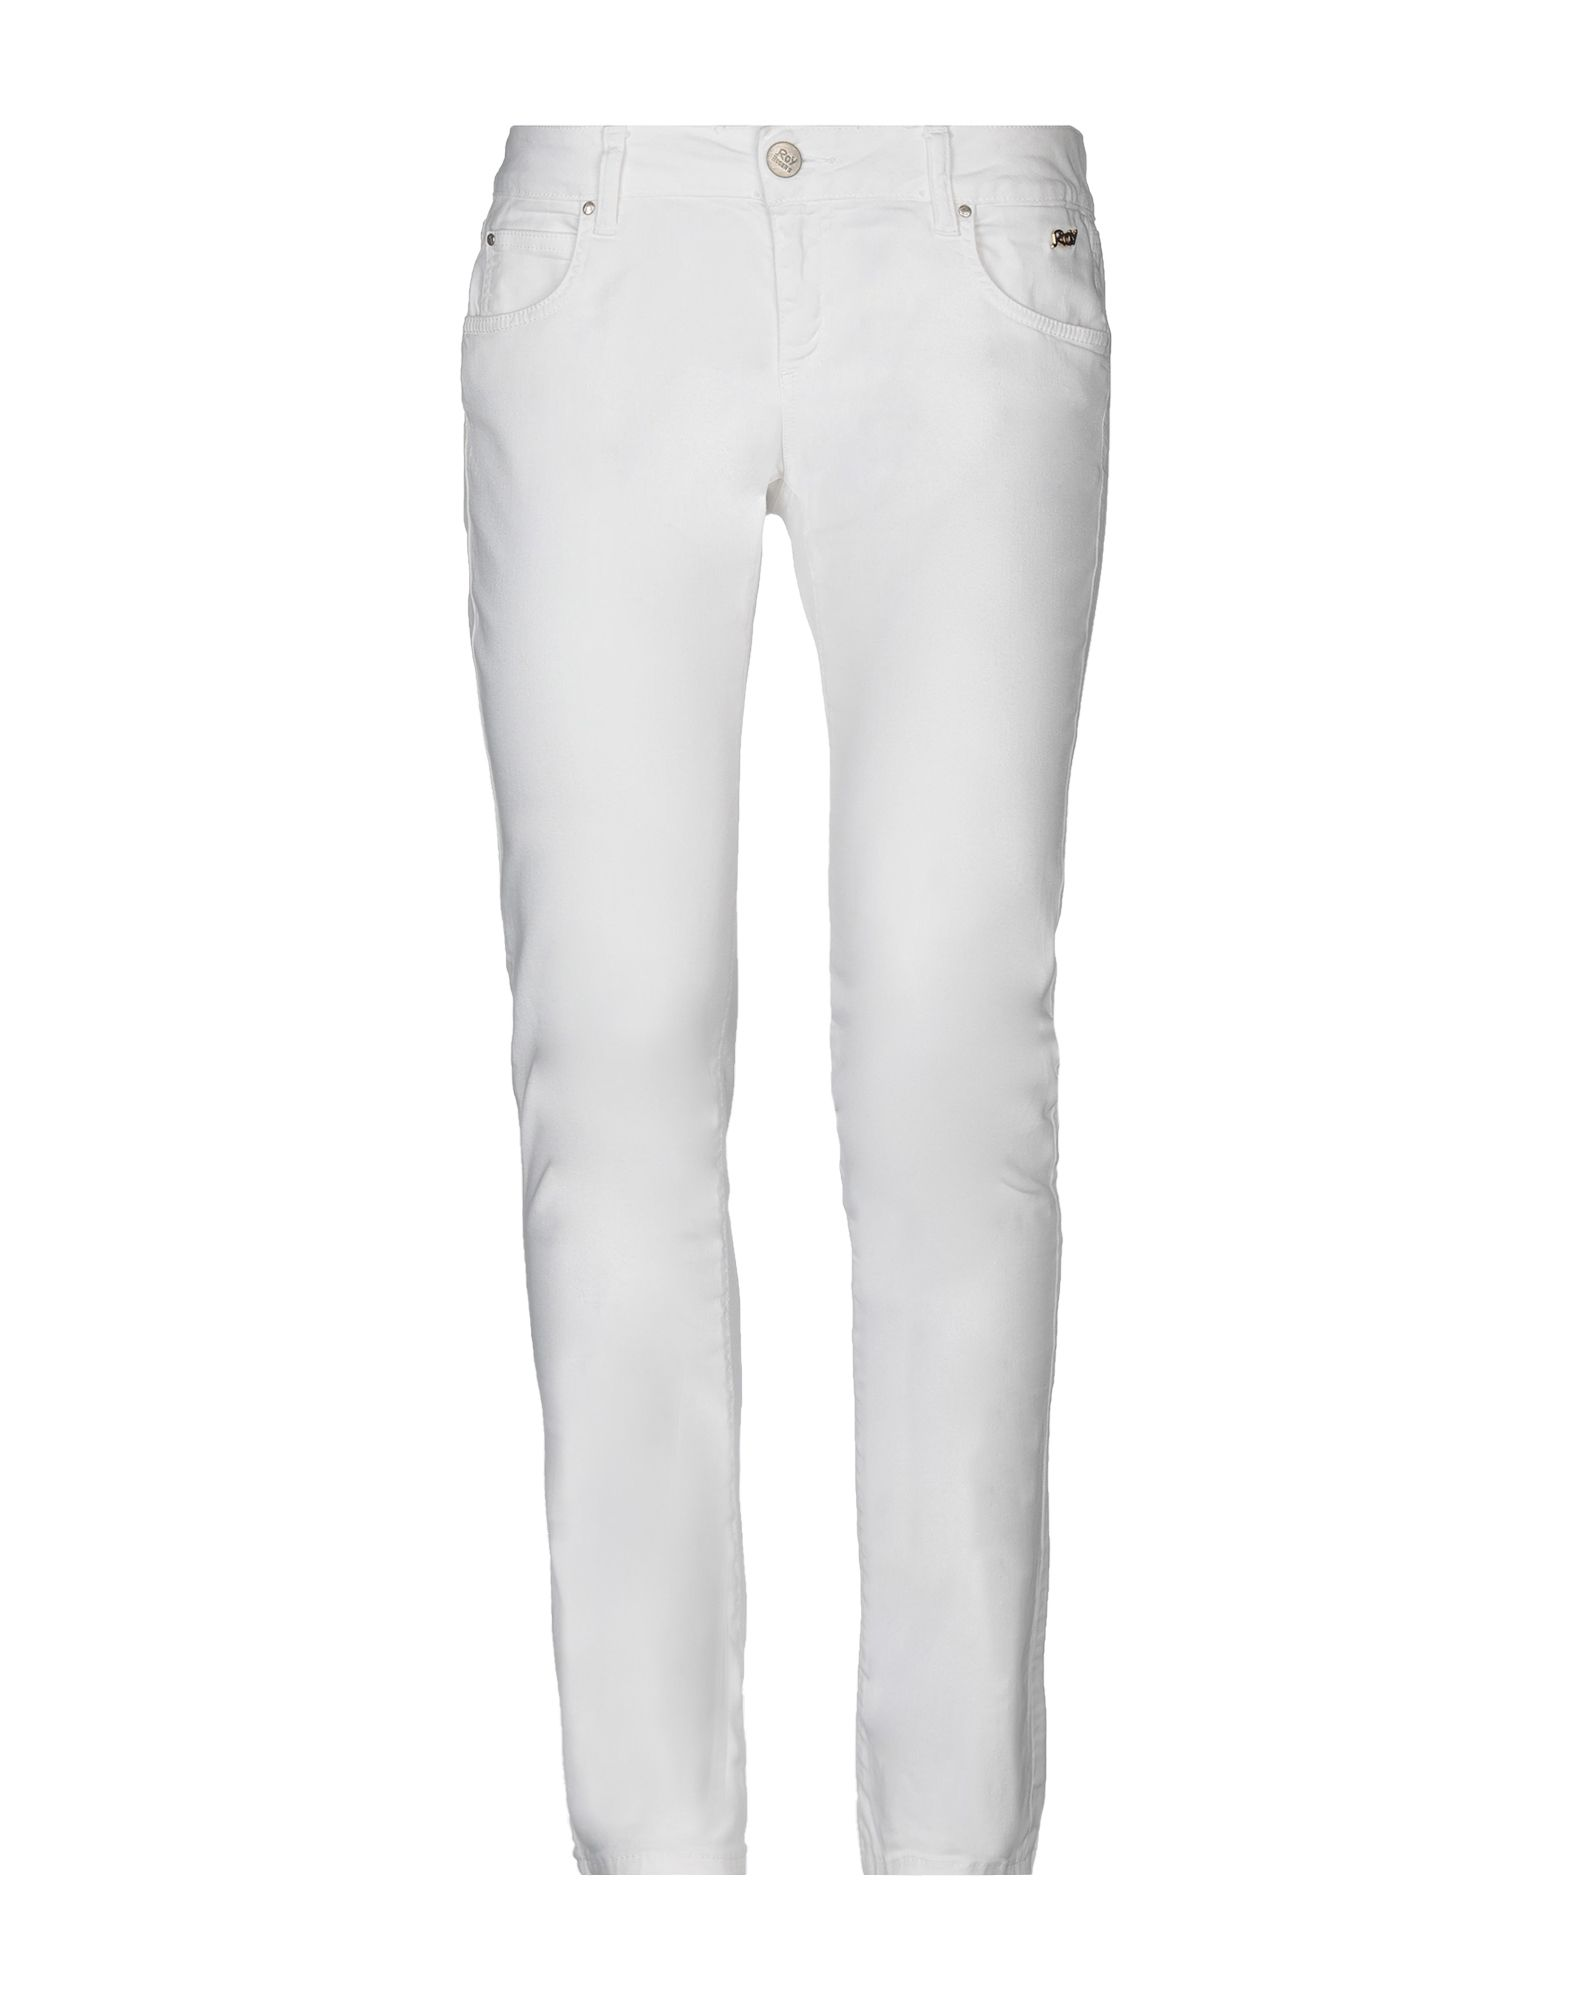 ROŸ ROGER'S CHOICE Джинсовые брюки choice джинсовые брюки